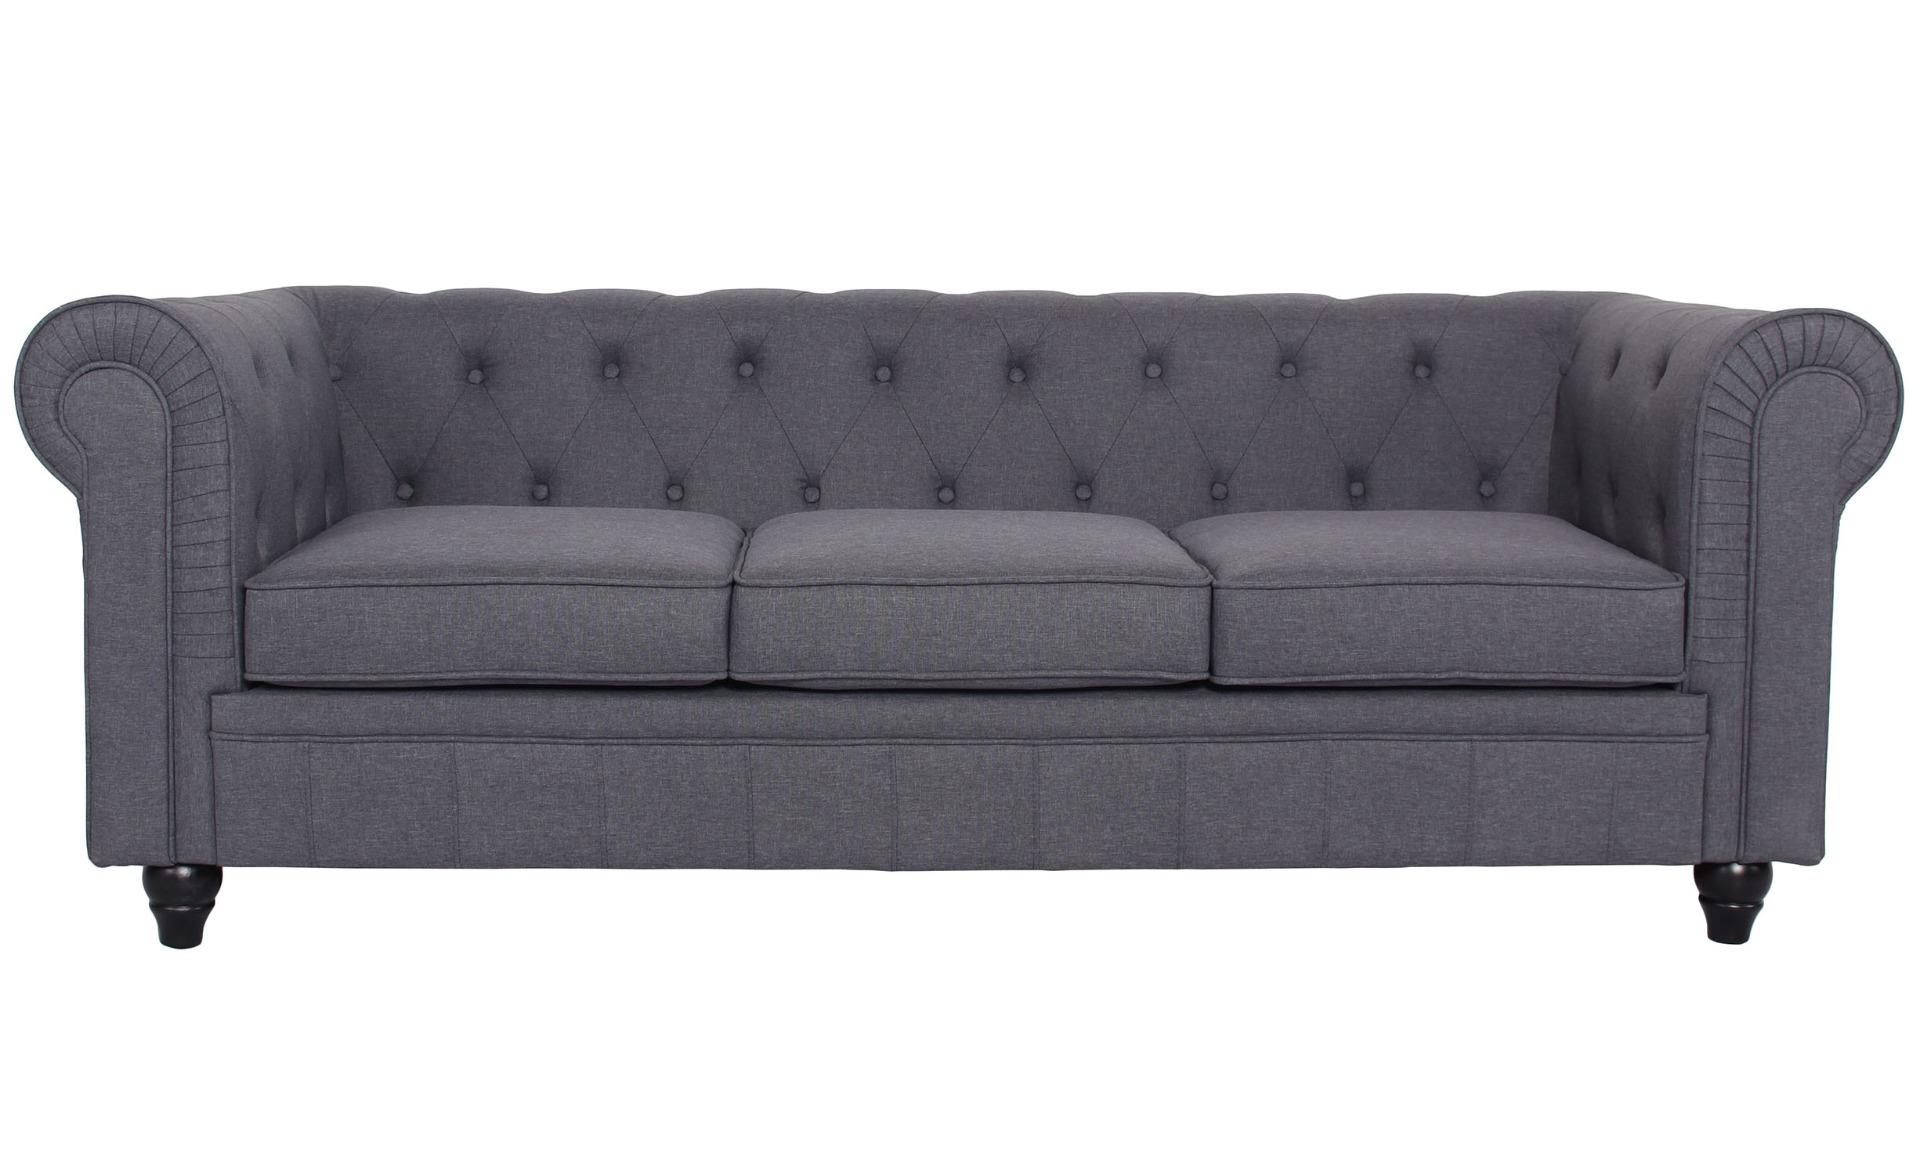 Grand canapé 3 places Chesterfield effet Lin Gris